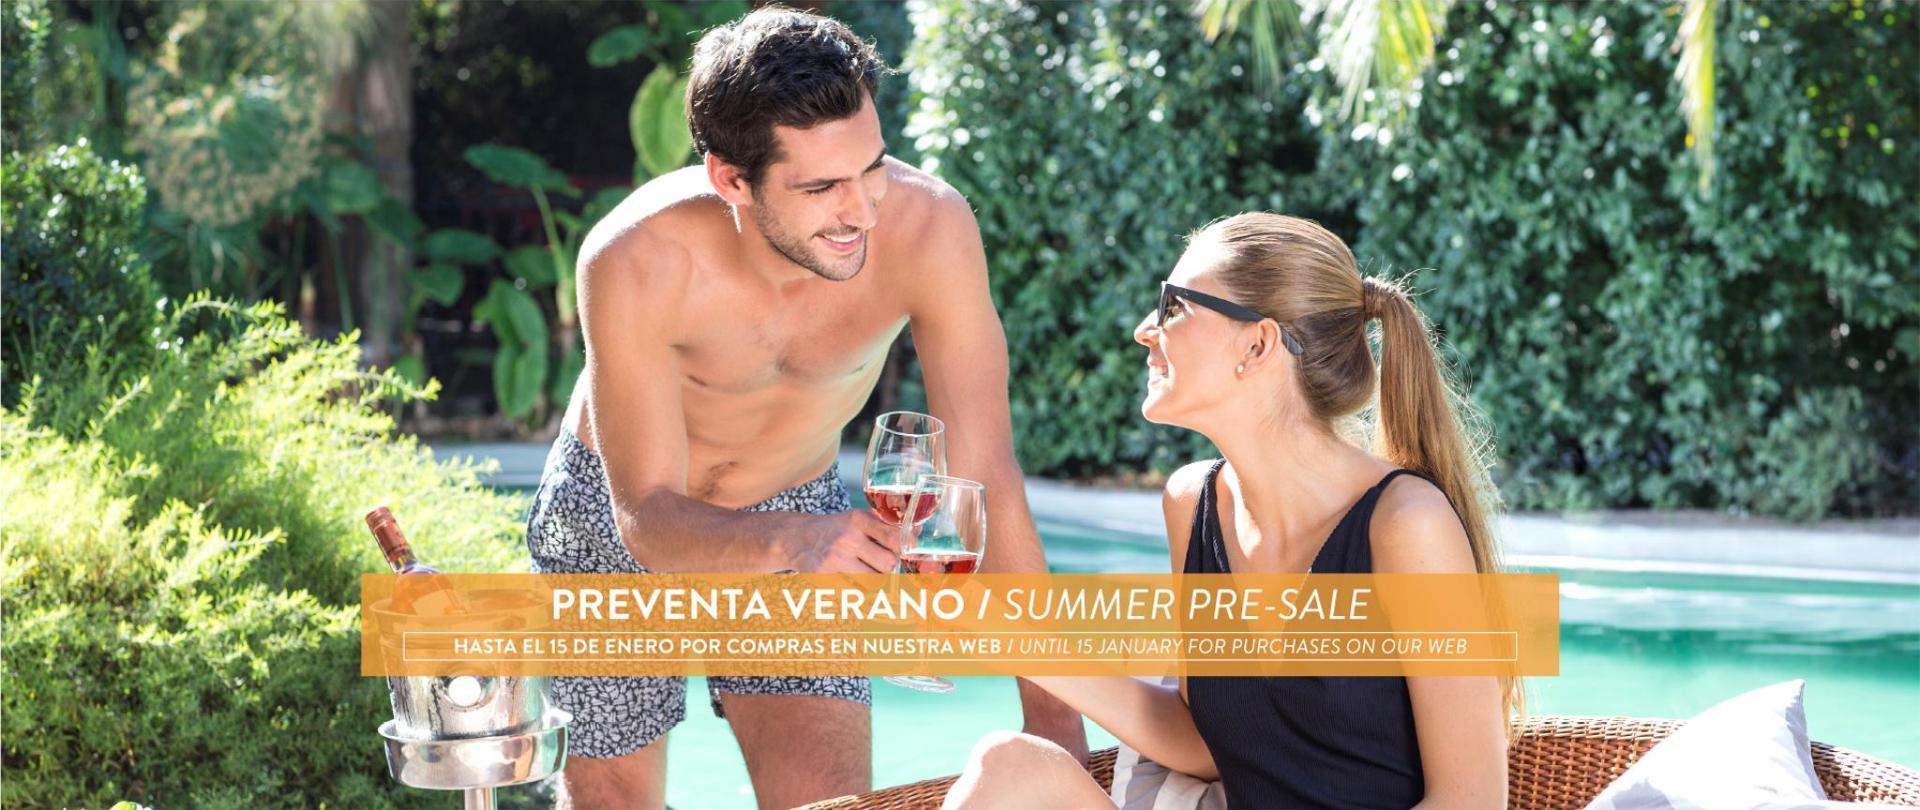 Pré-venda Verano HSCP.png